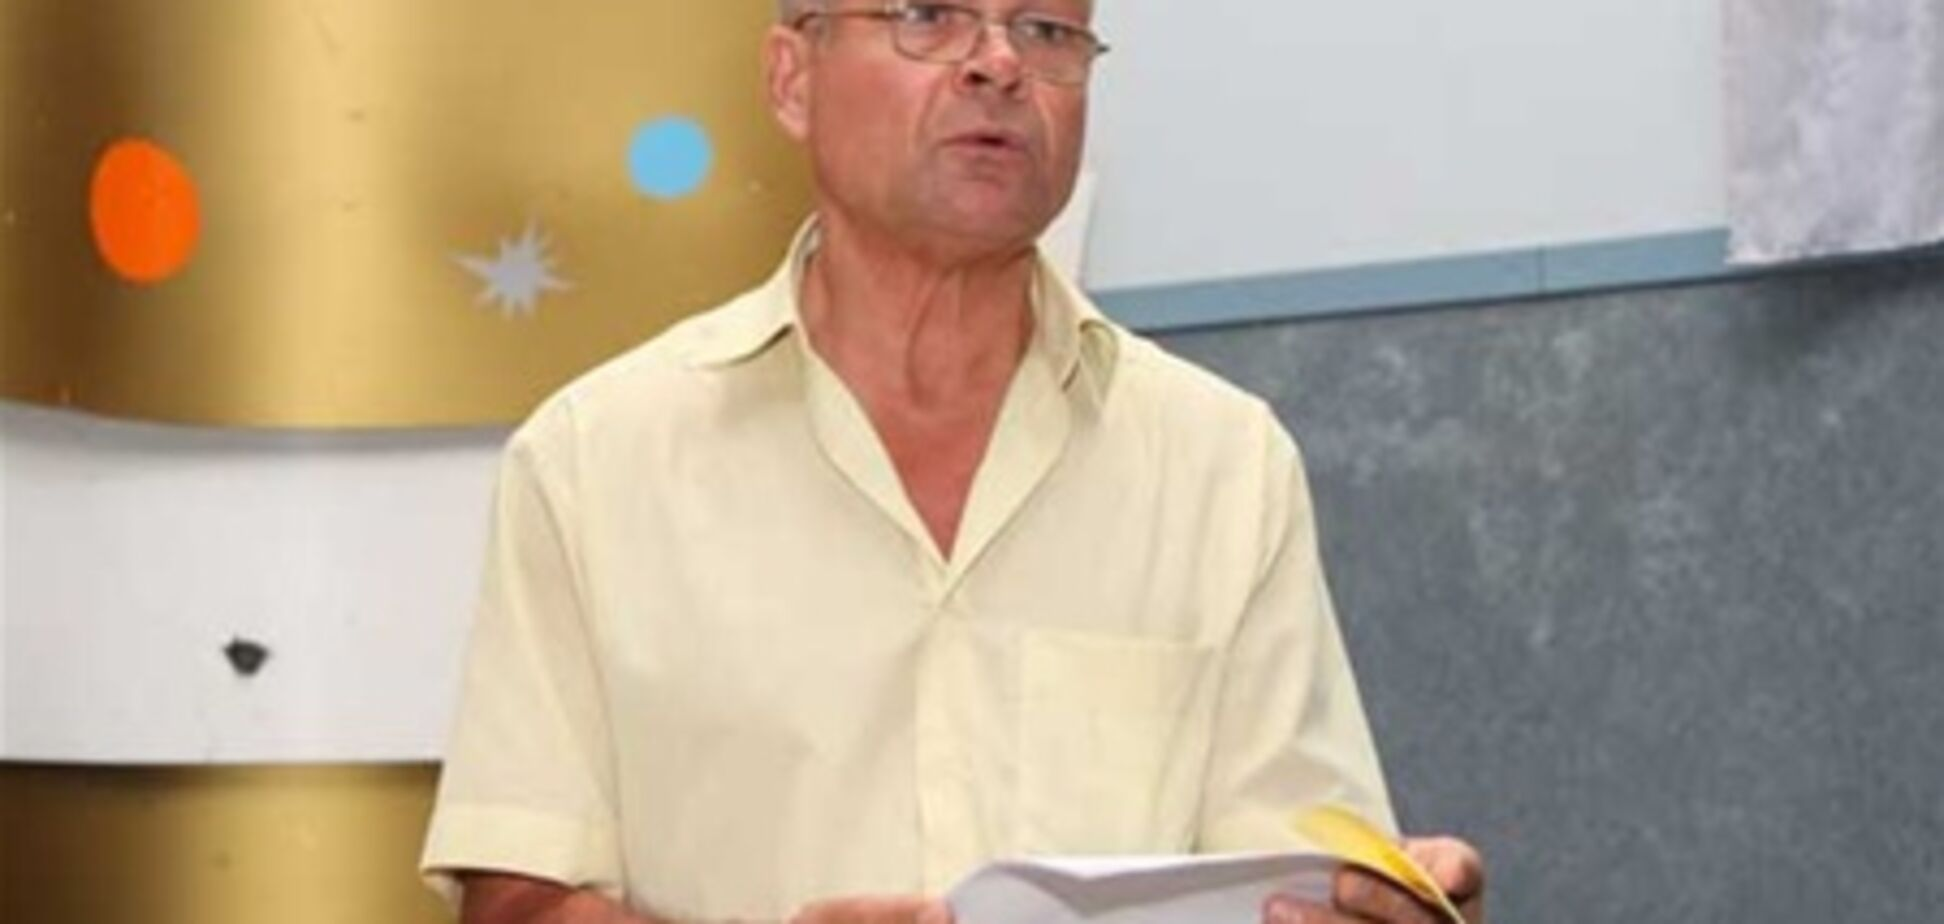 Карпачева уверена в том, что мэра Малого Маяка довели до самоубийства